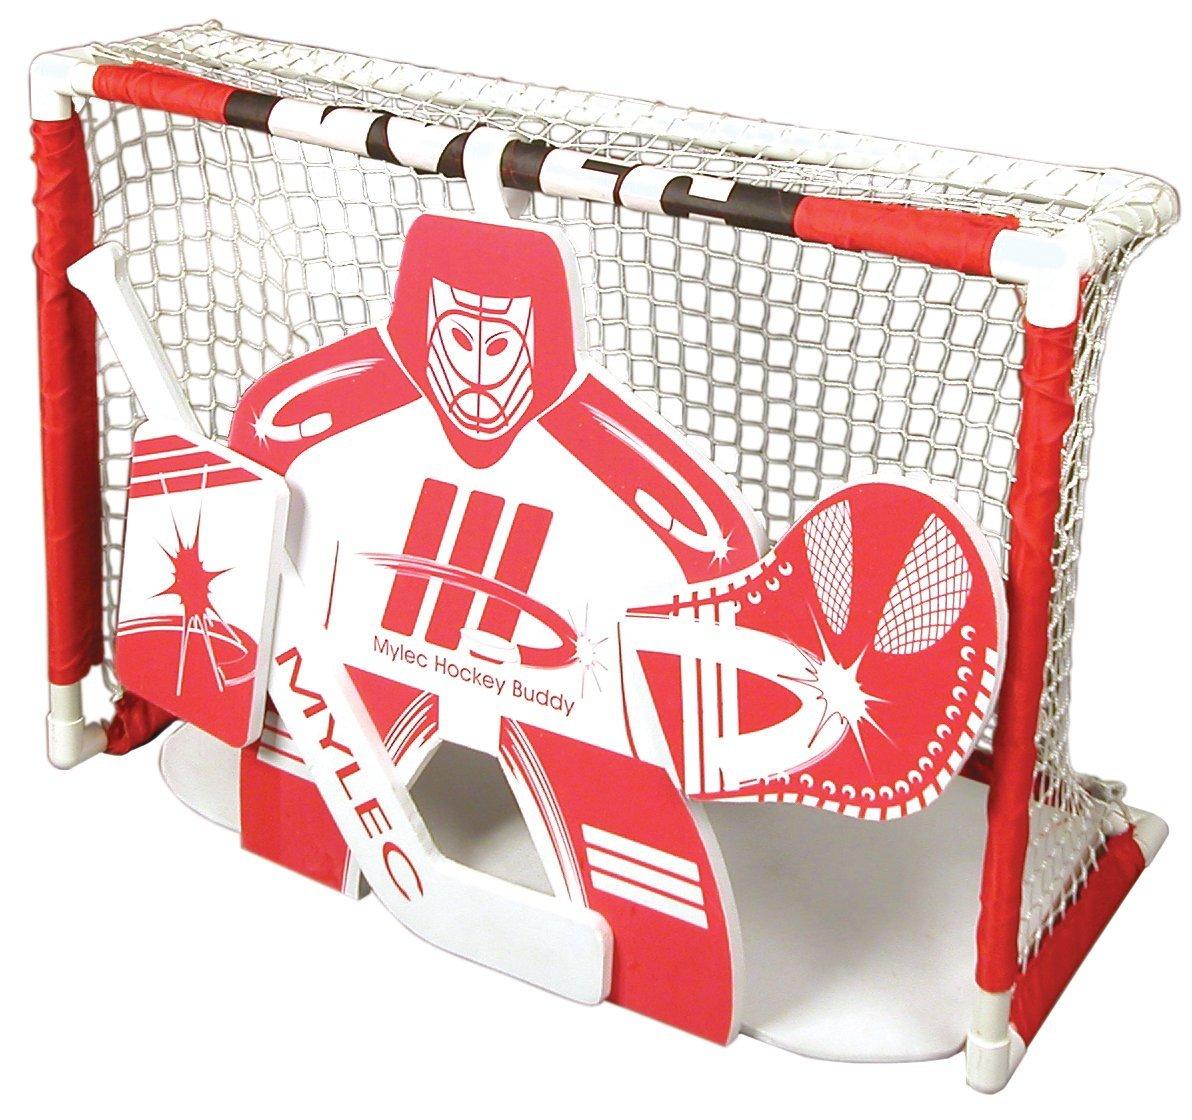 Mylec Goal Hockey Buddy